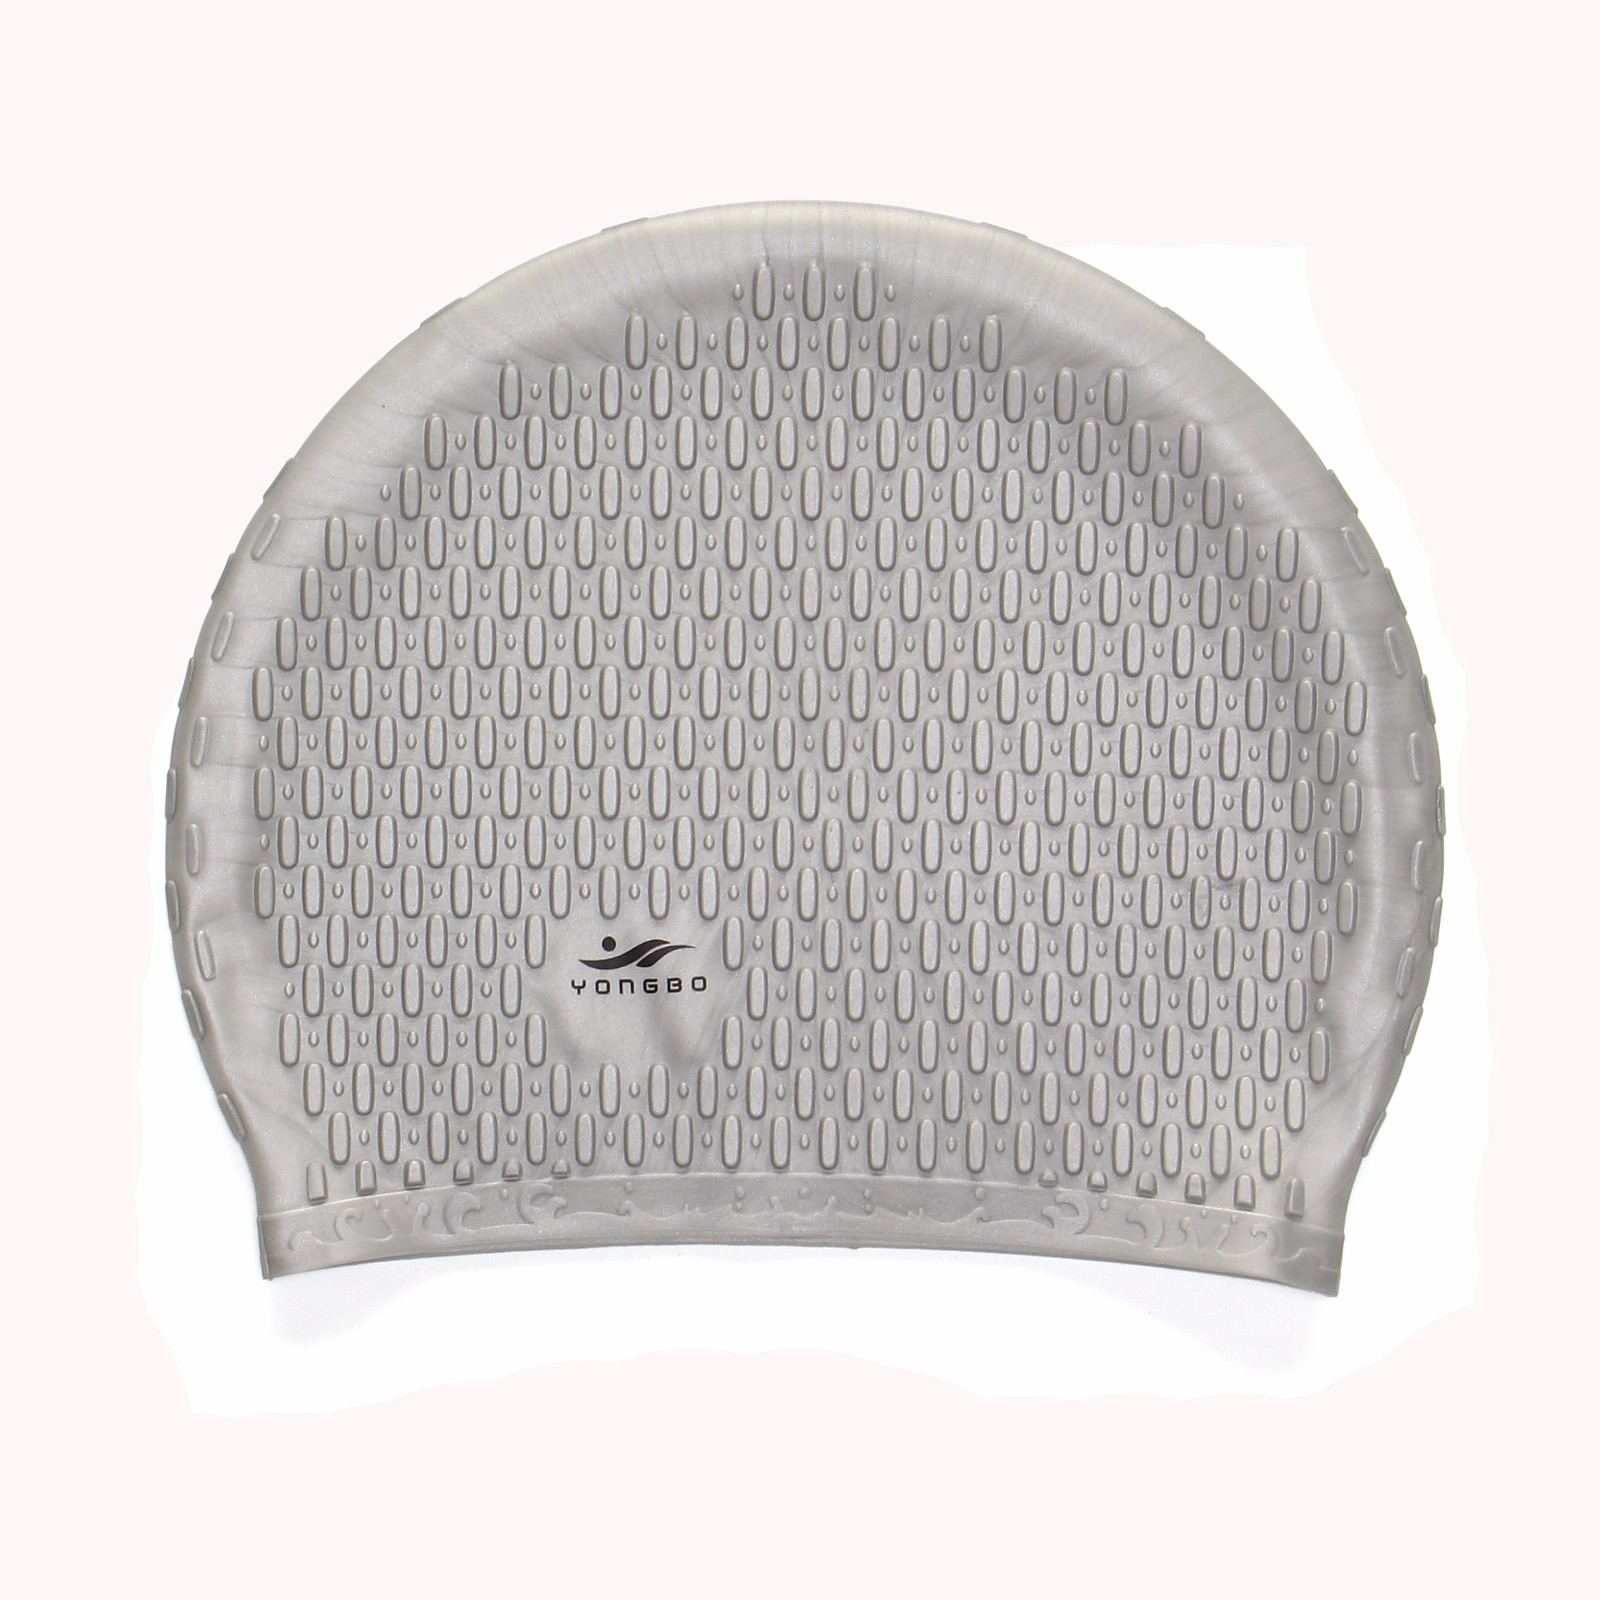 Hot Swimming Cap Manufacturers, Hot Swimming Cap Factory, Supply Hot Swimming Cap